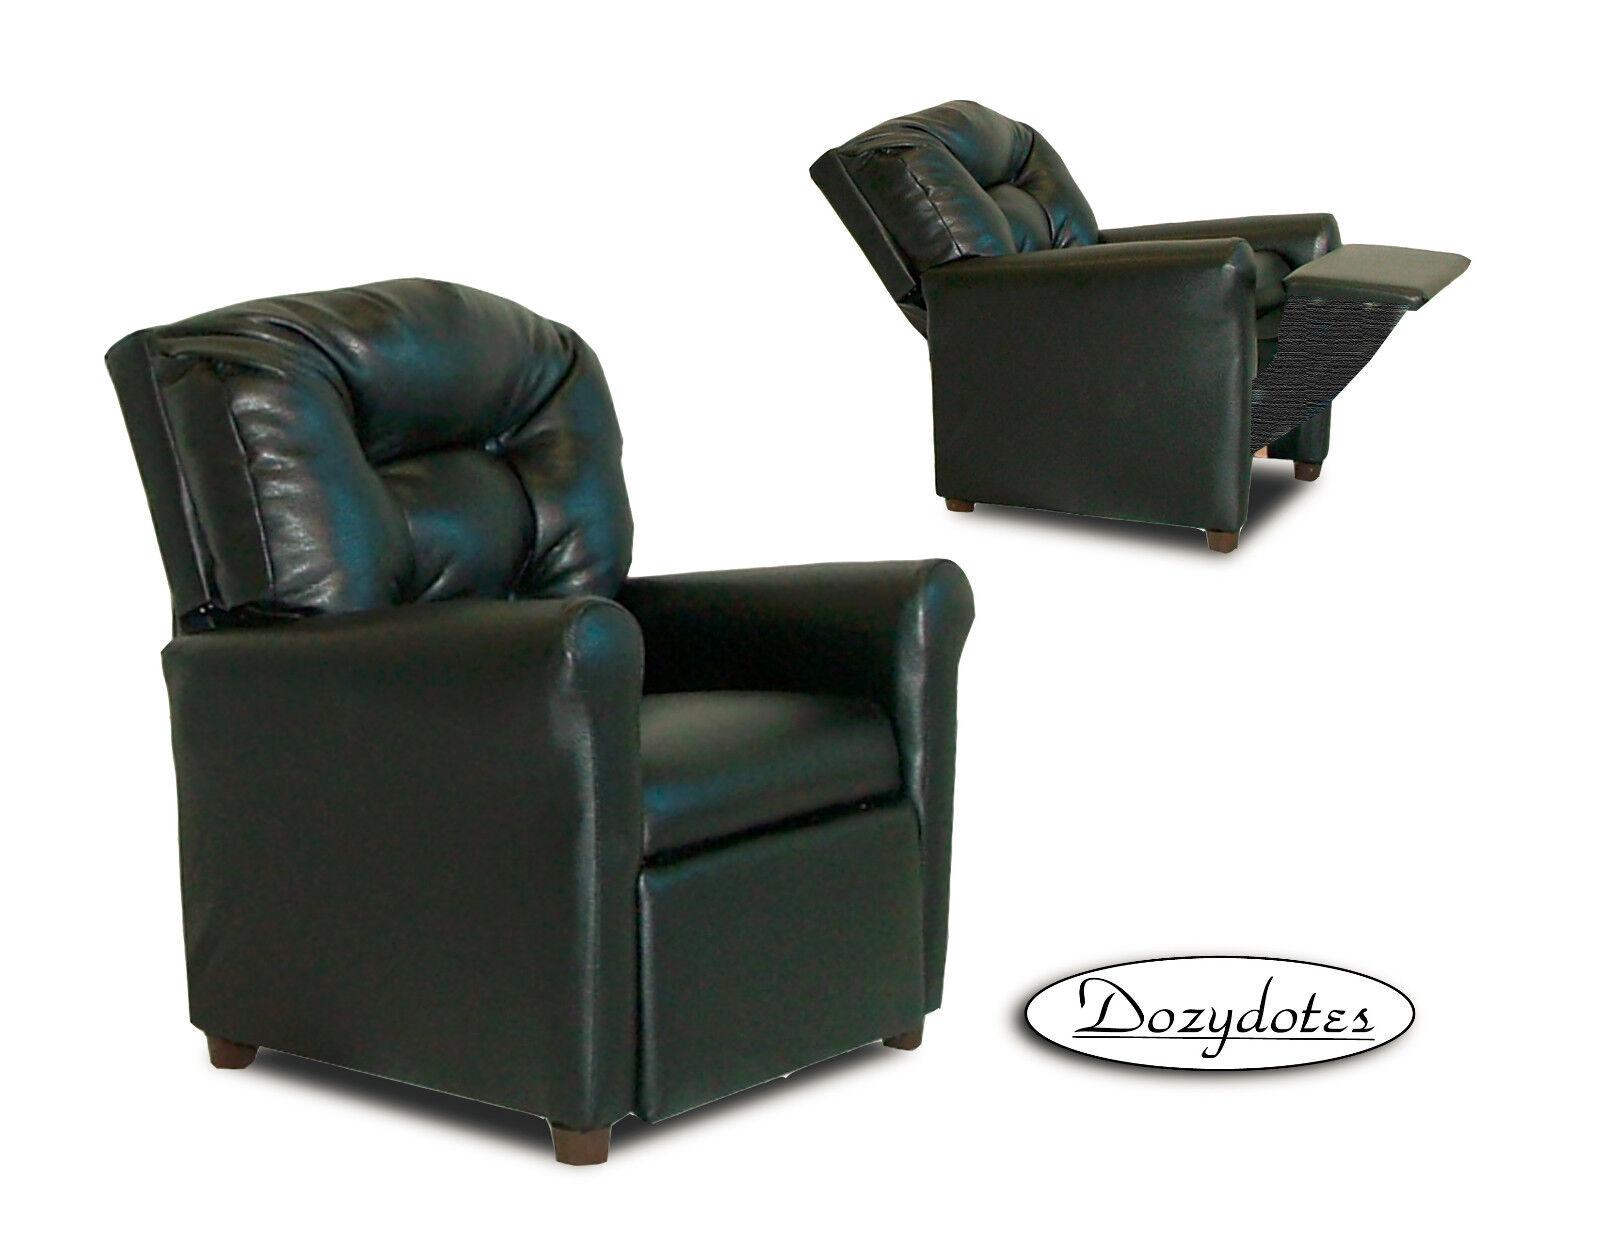 Black 4 Button Child Recliner Chair - Reclining Chair for Ki